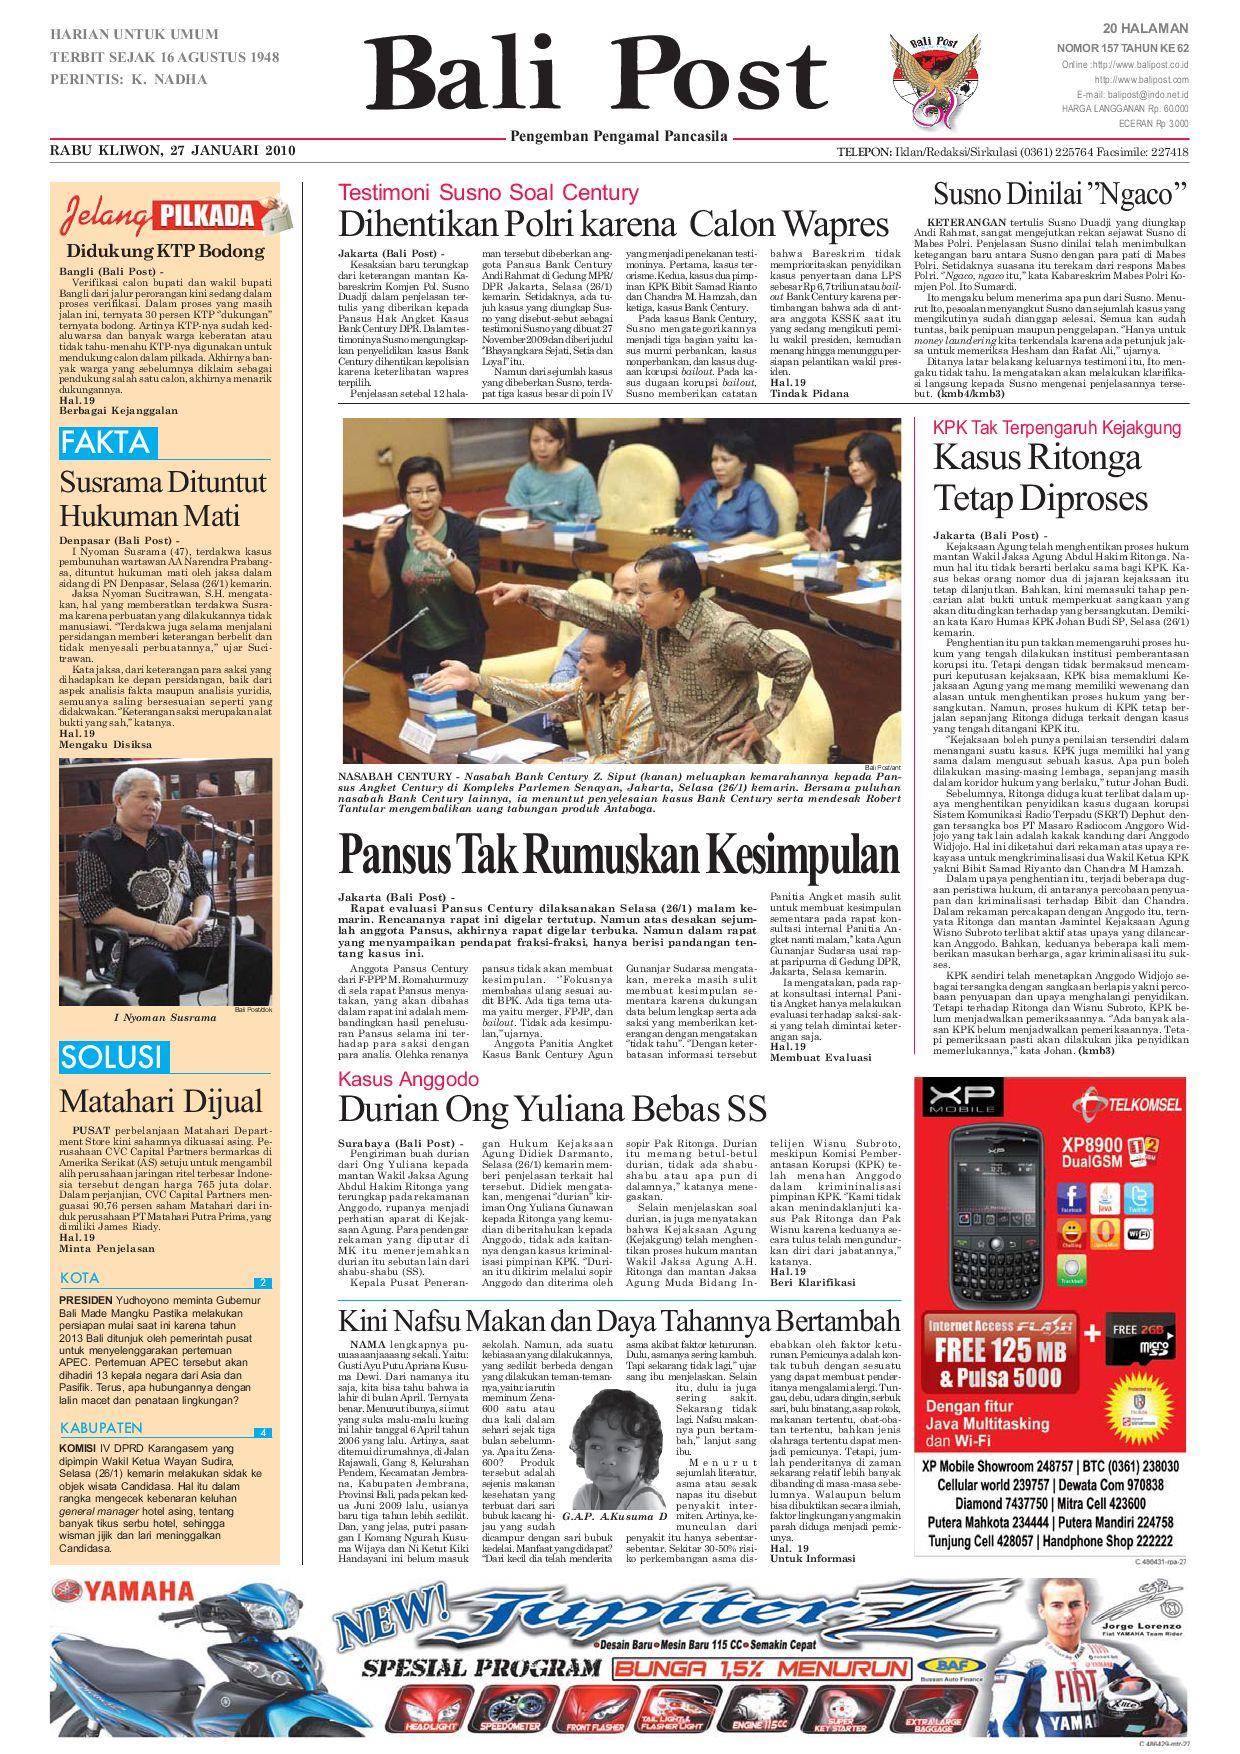 Edisi 27 Januari 2010  1486a35a58